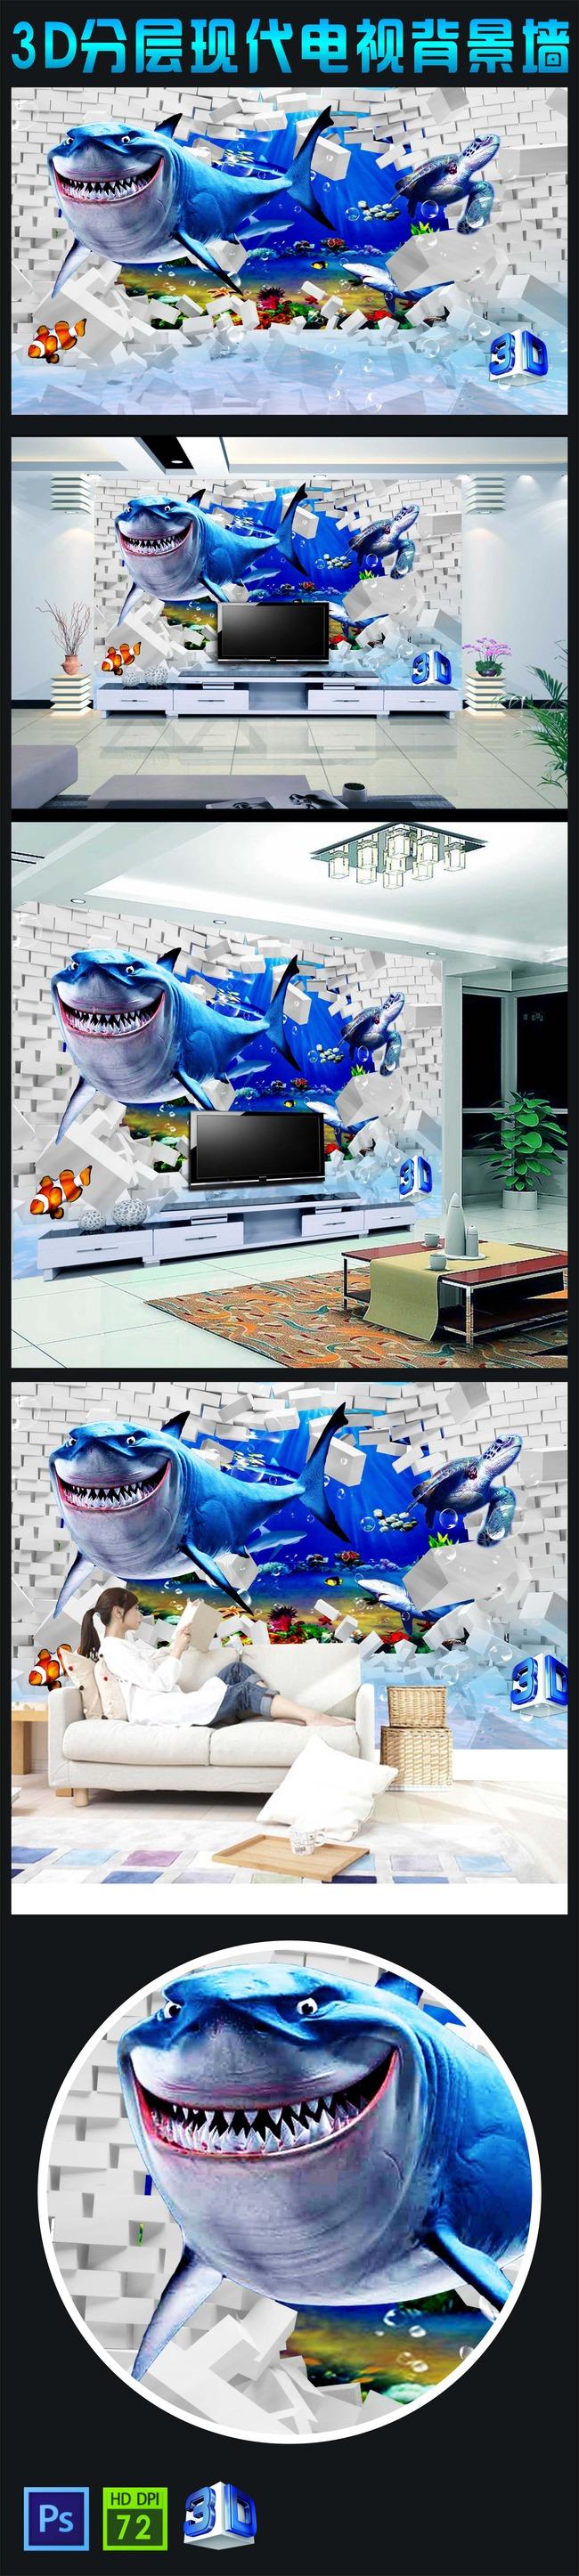 3d海底总动员鲨鱼背景墙模板下载